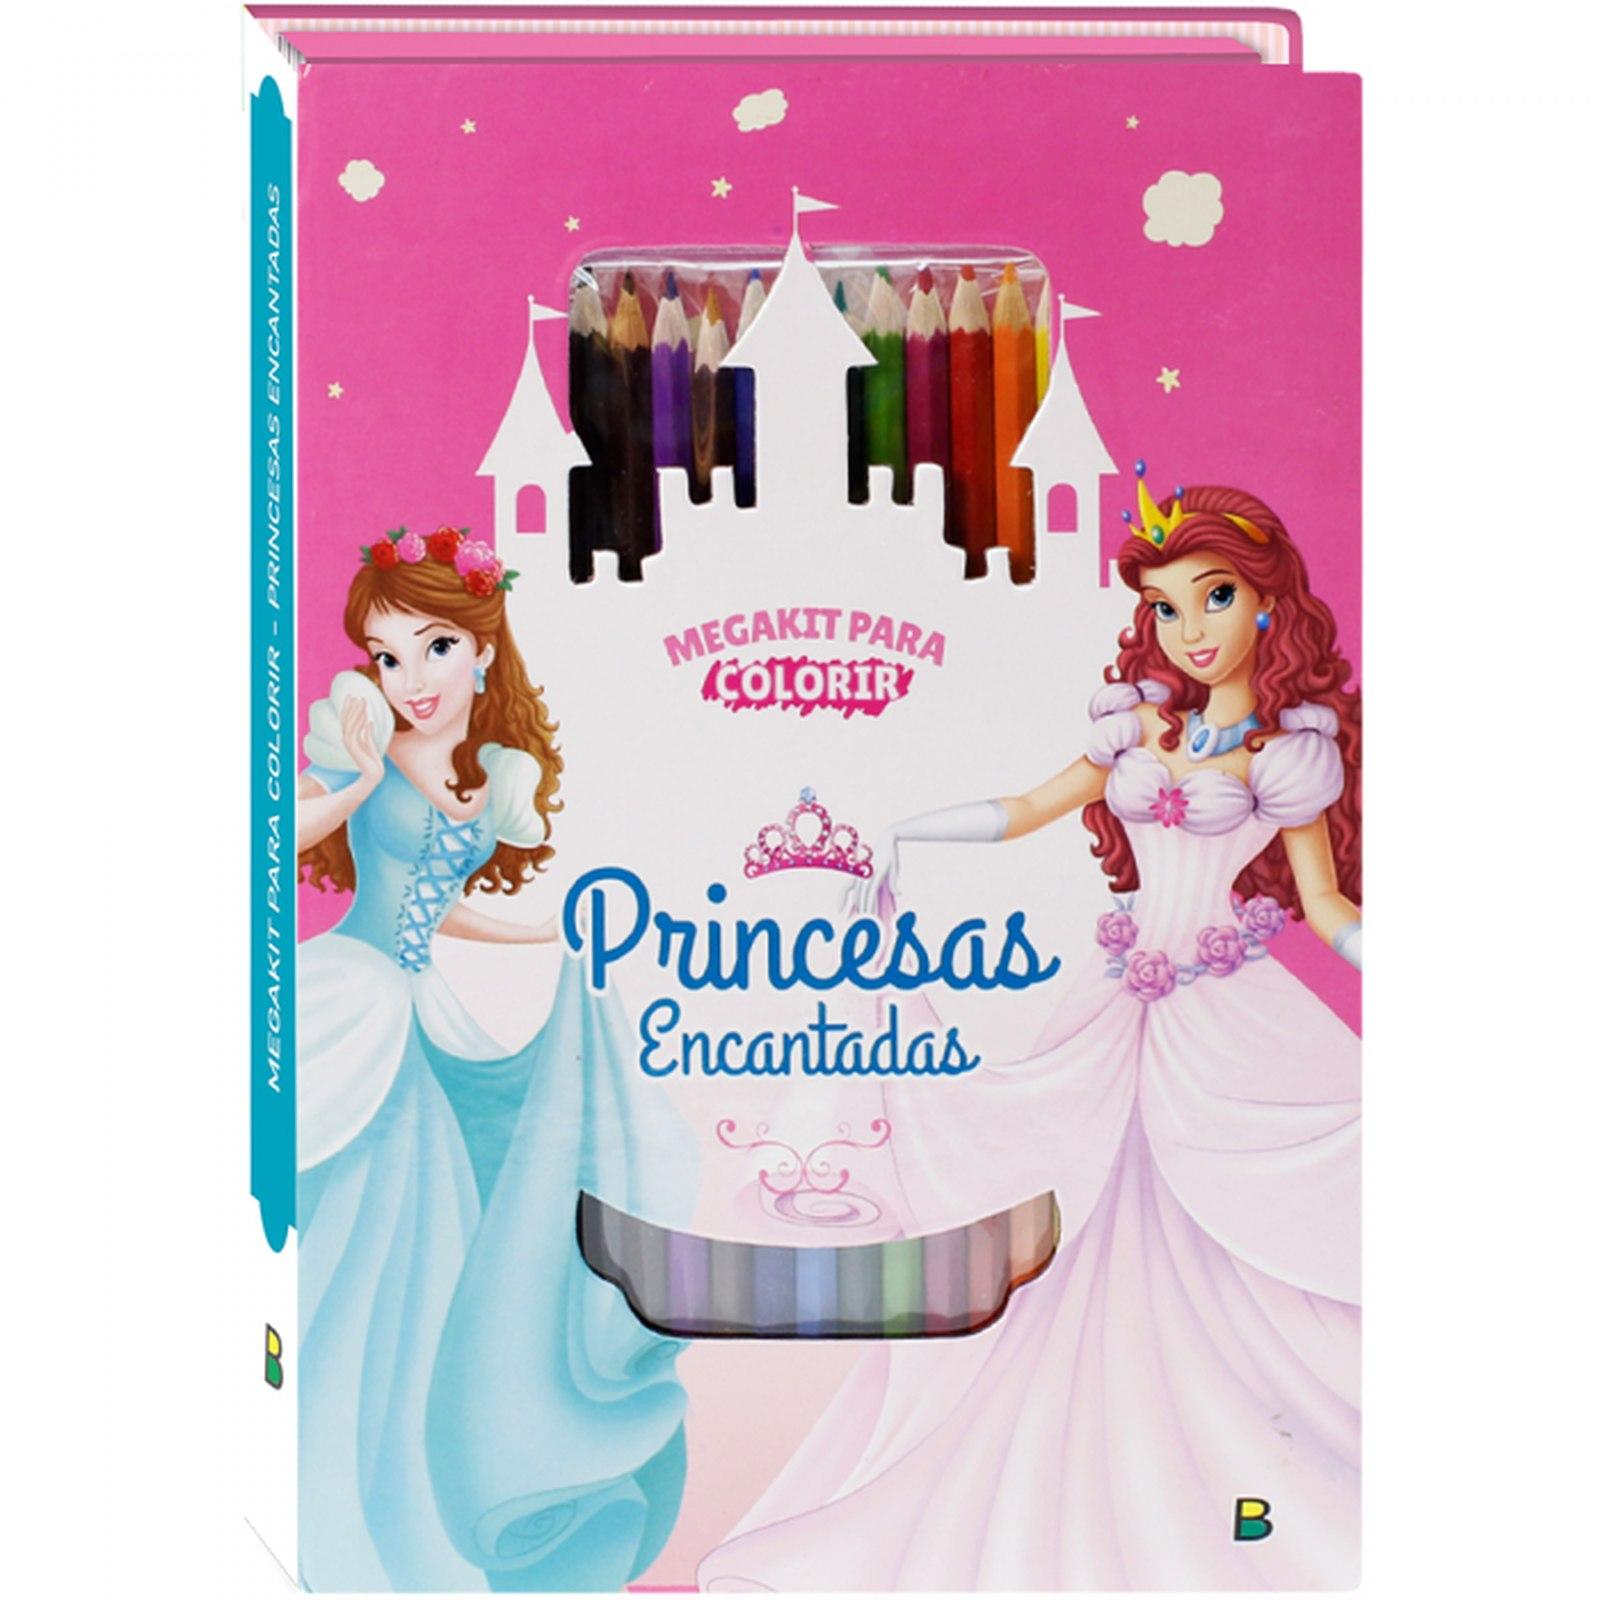 Megakit Para Colorir: Princesas Encantadas Todolivro